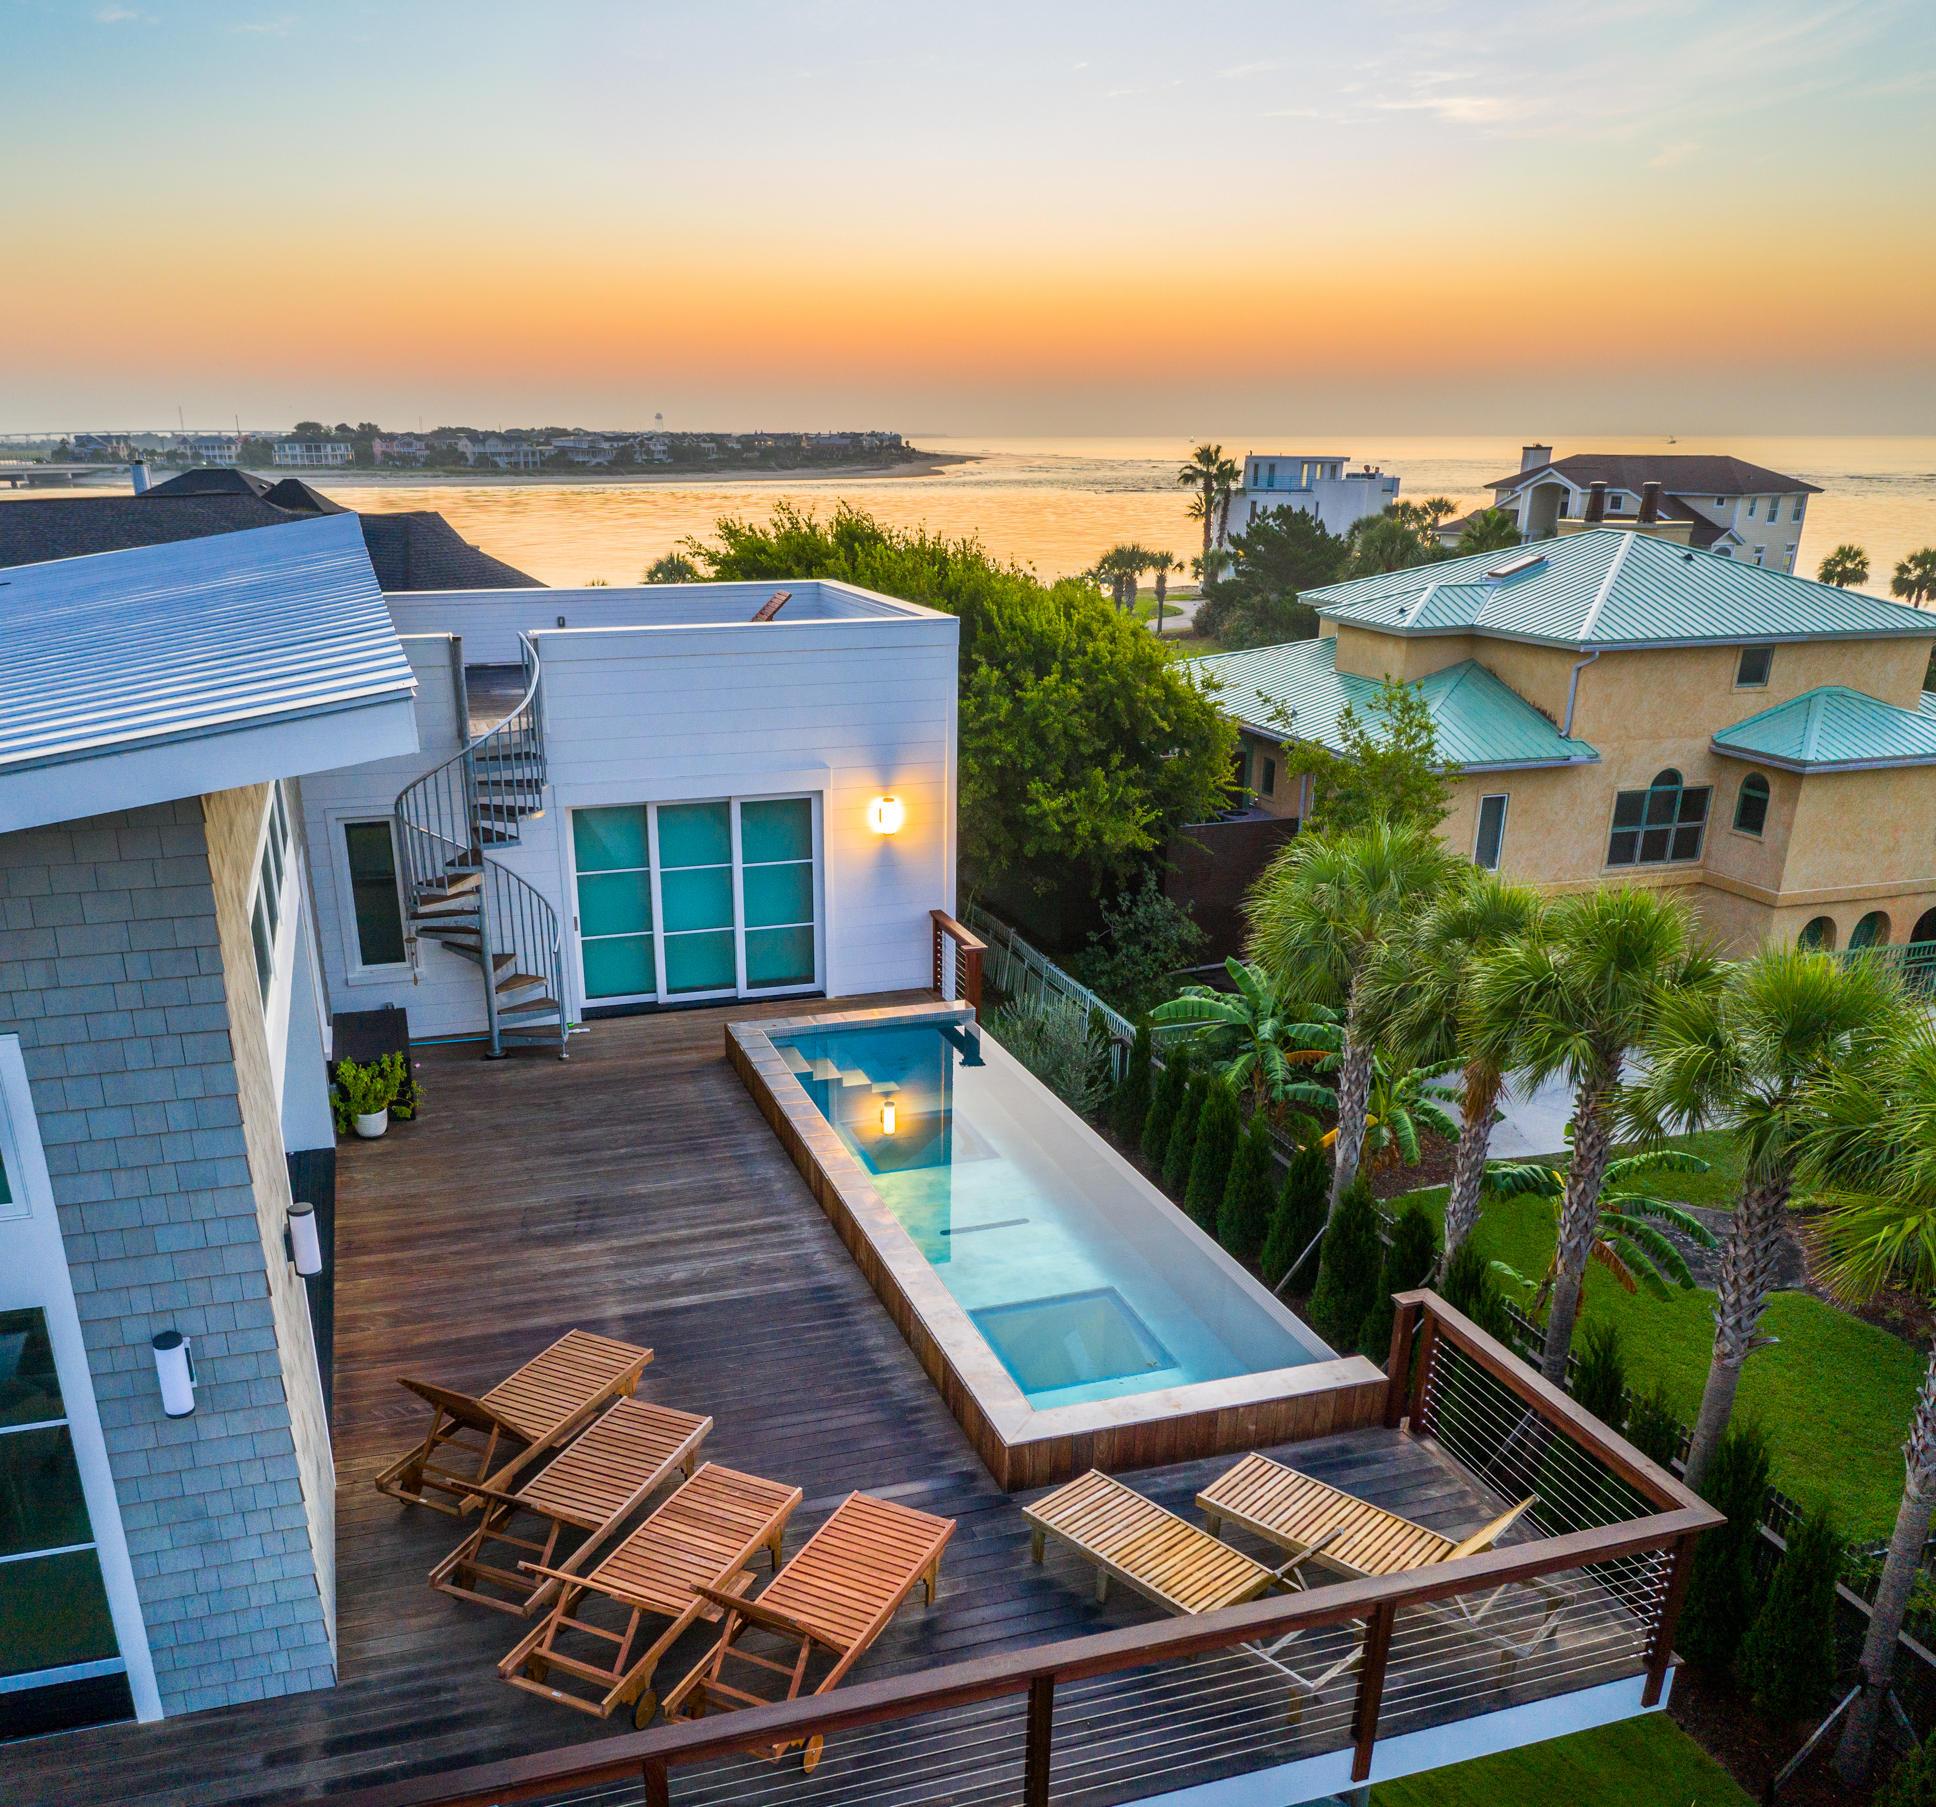 Sullivans Island Homes For Sale - 3115 Ion, Sullivans Island, SC - 4